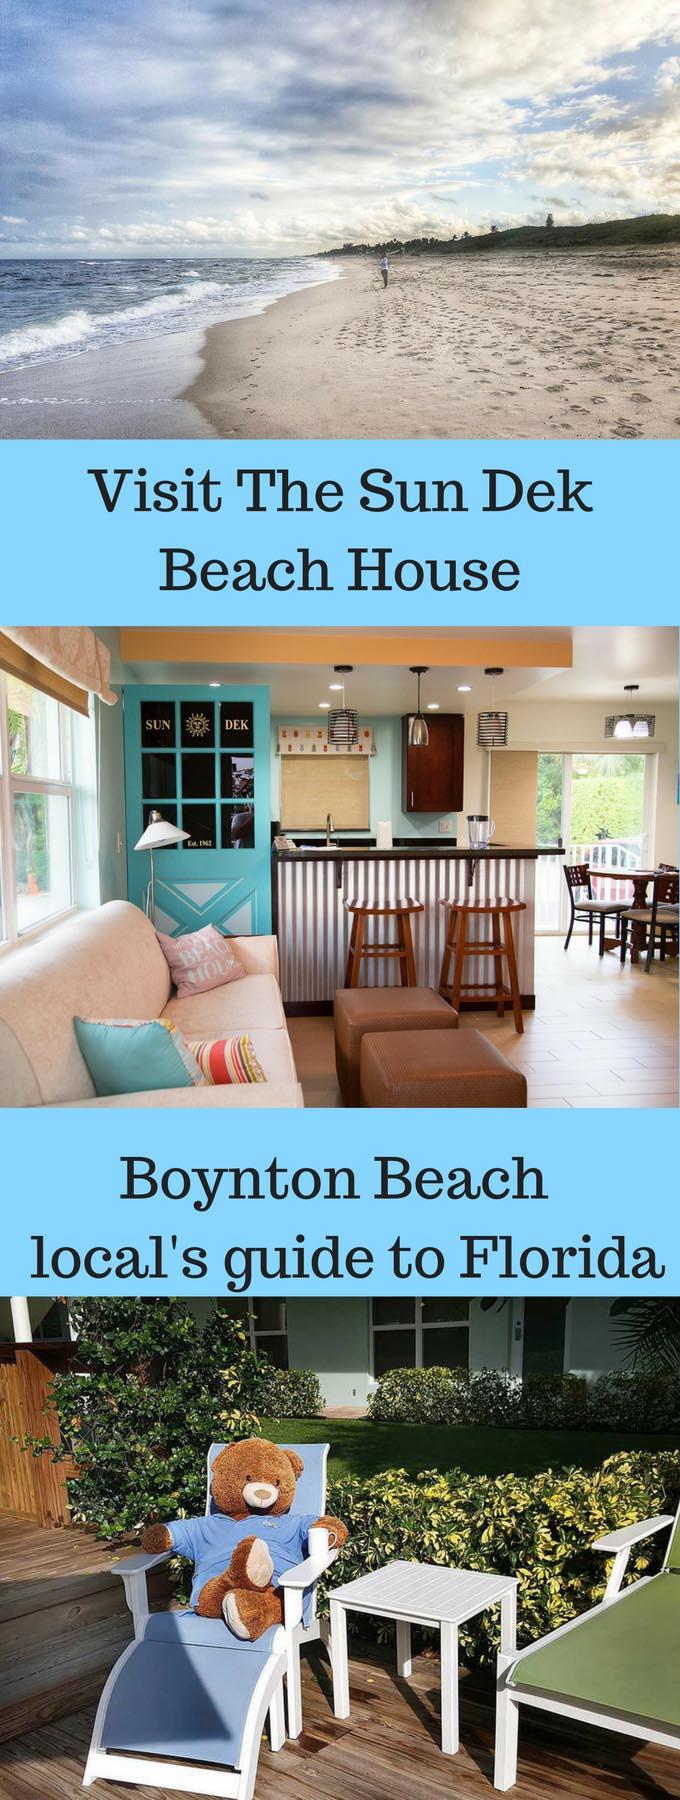 The Sun Dek Beach House - A Local\'s Guide to Florida